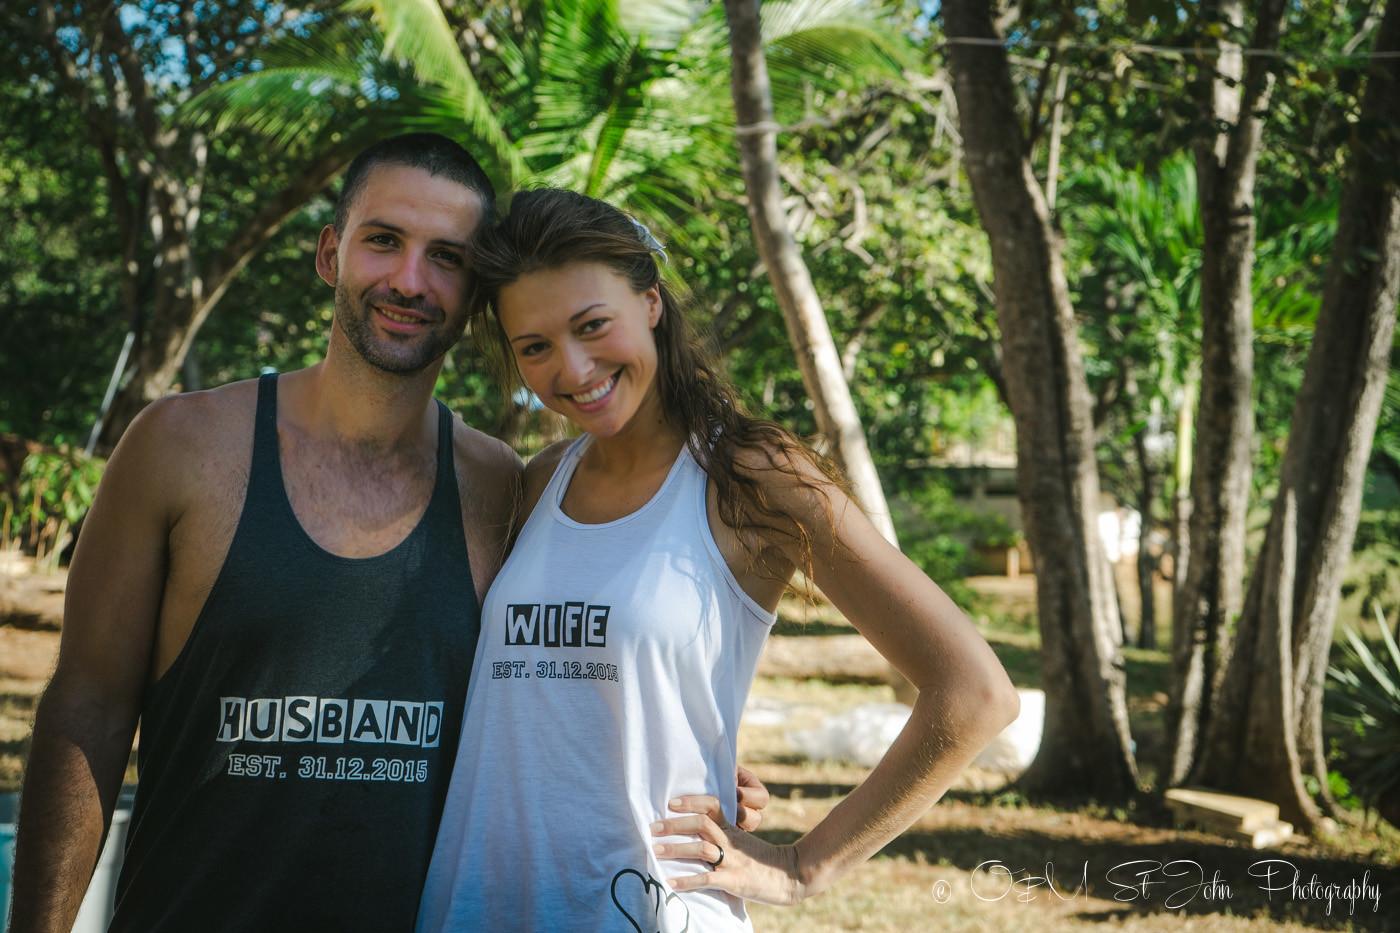 Oksana and Max. Mr & Mrs. Wedding. Costa Rica